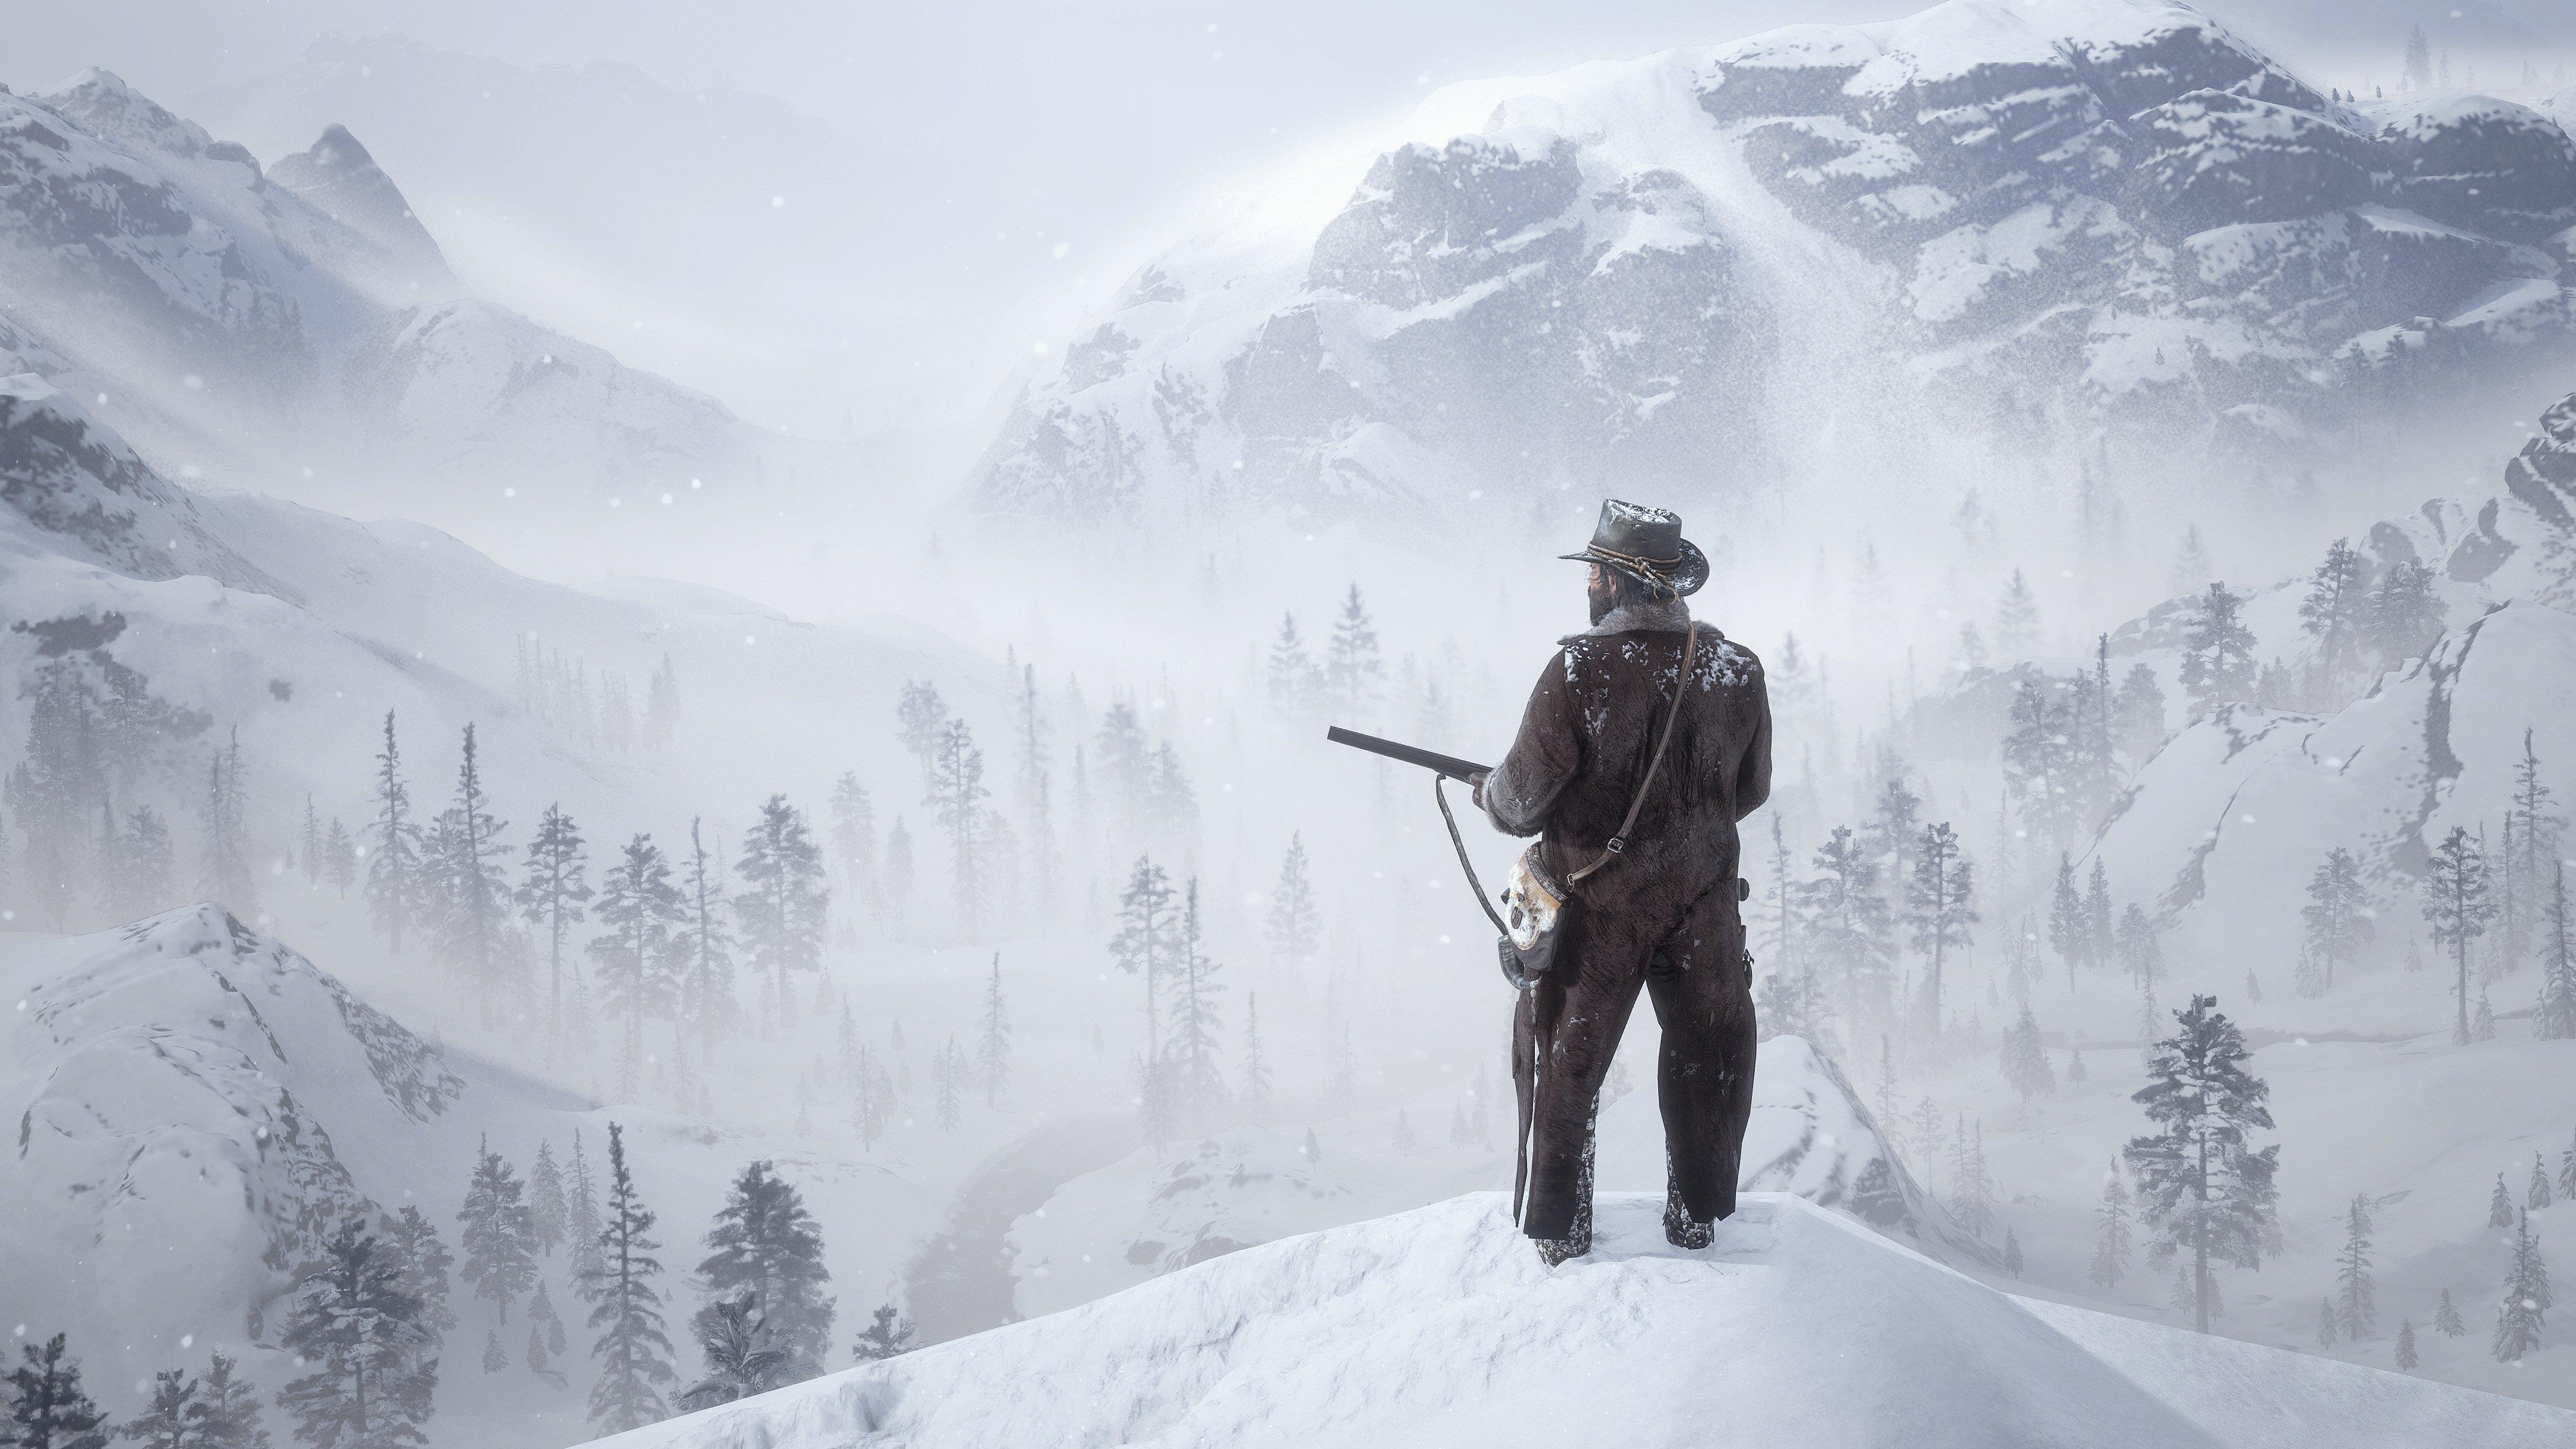 Fondos de pantalla Red Dead Redemption 2 The bounty hunter